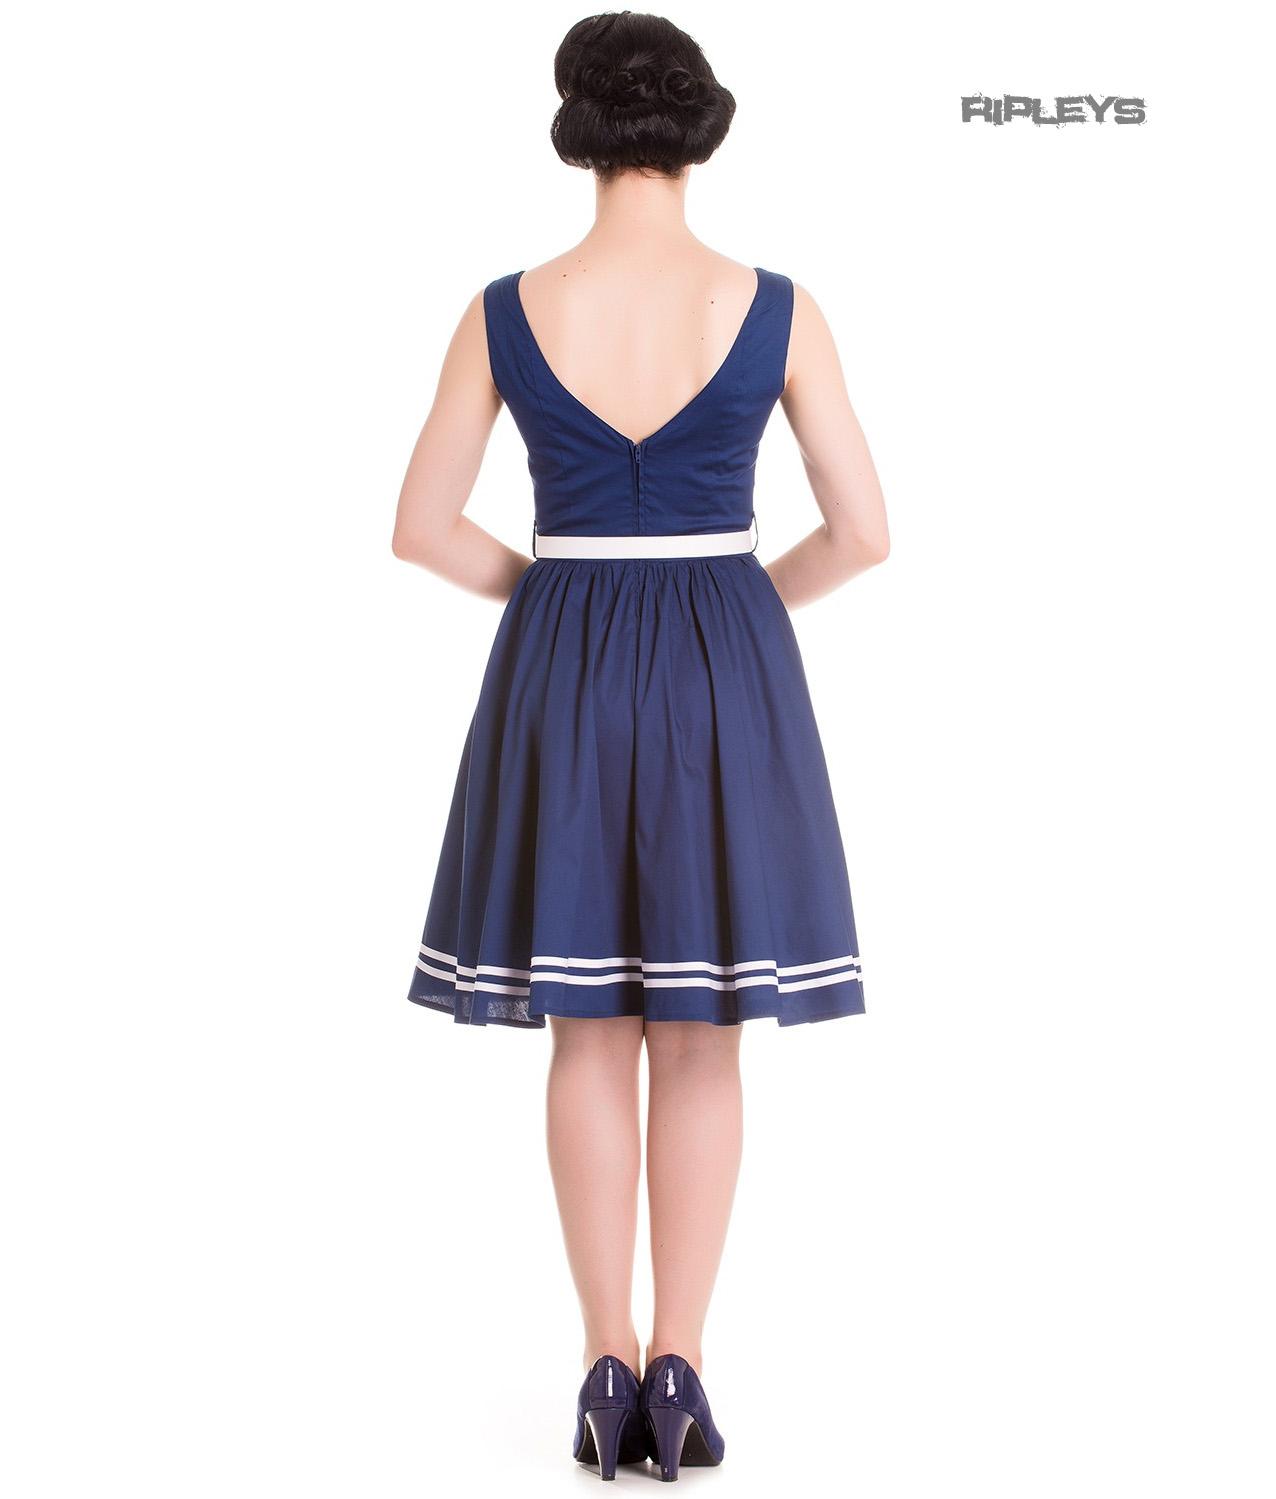 Hell-Bunny-Nautical-Sailor-Pin-Up-Mid-Length-50s-Dress-ARIEL-Navy-Blue-All-Sizes thumbnail 4